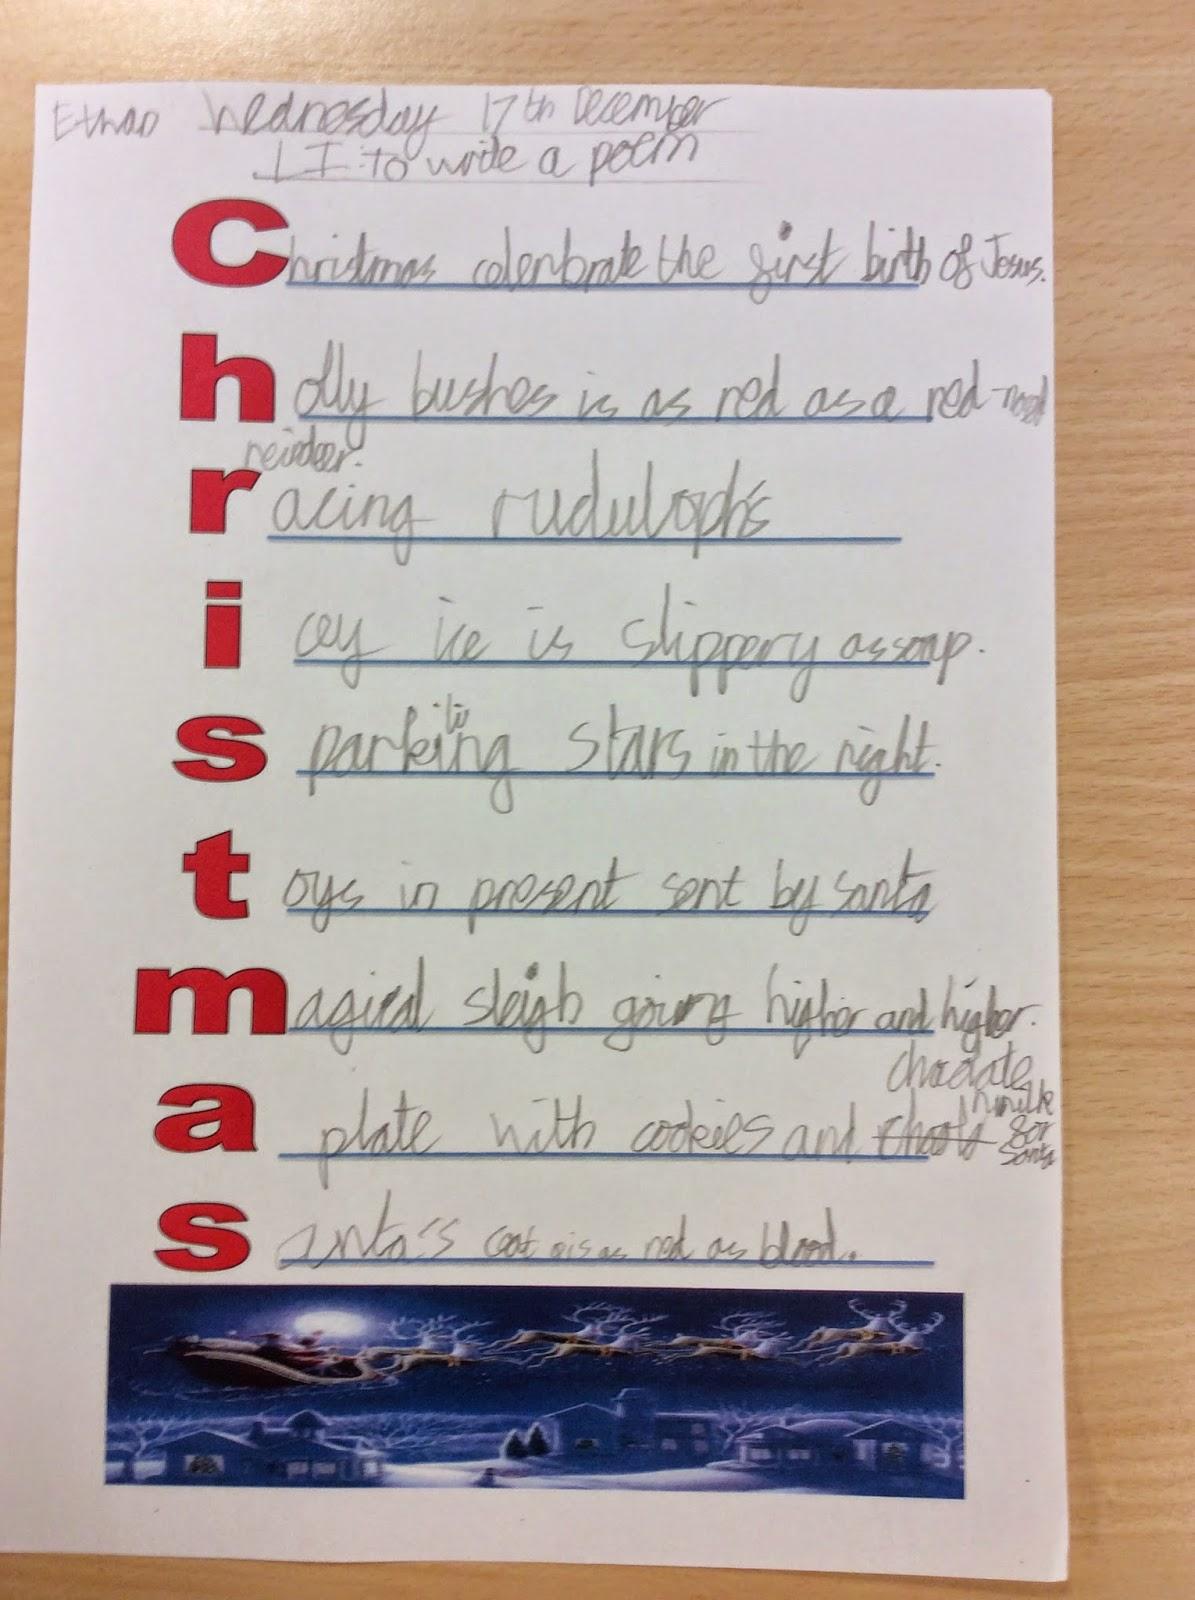 merry christmas acrostic poem that rhymes